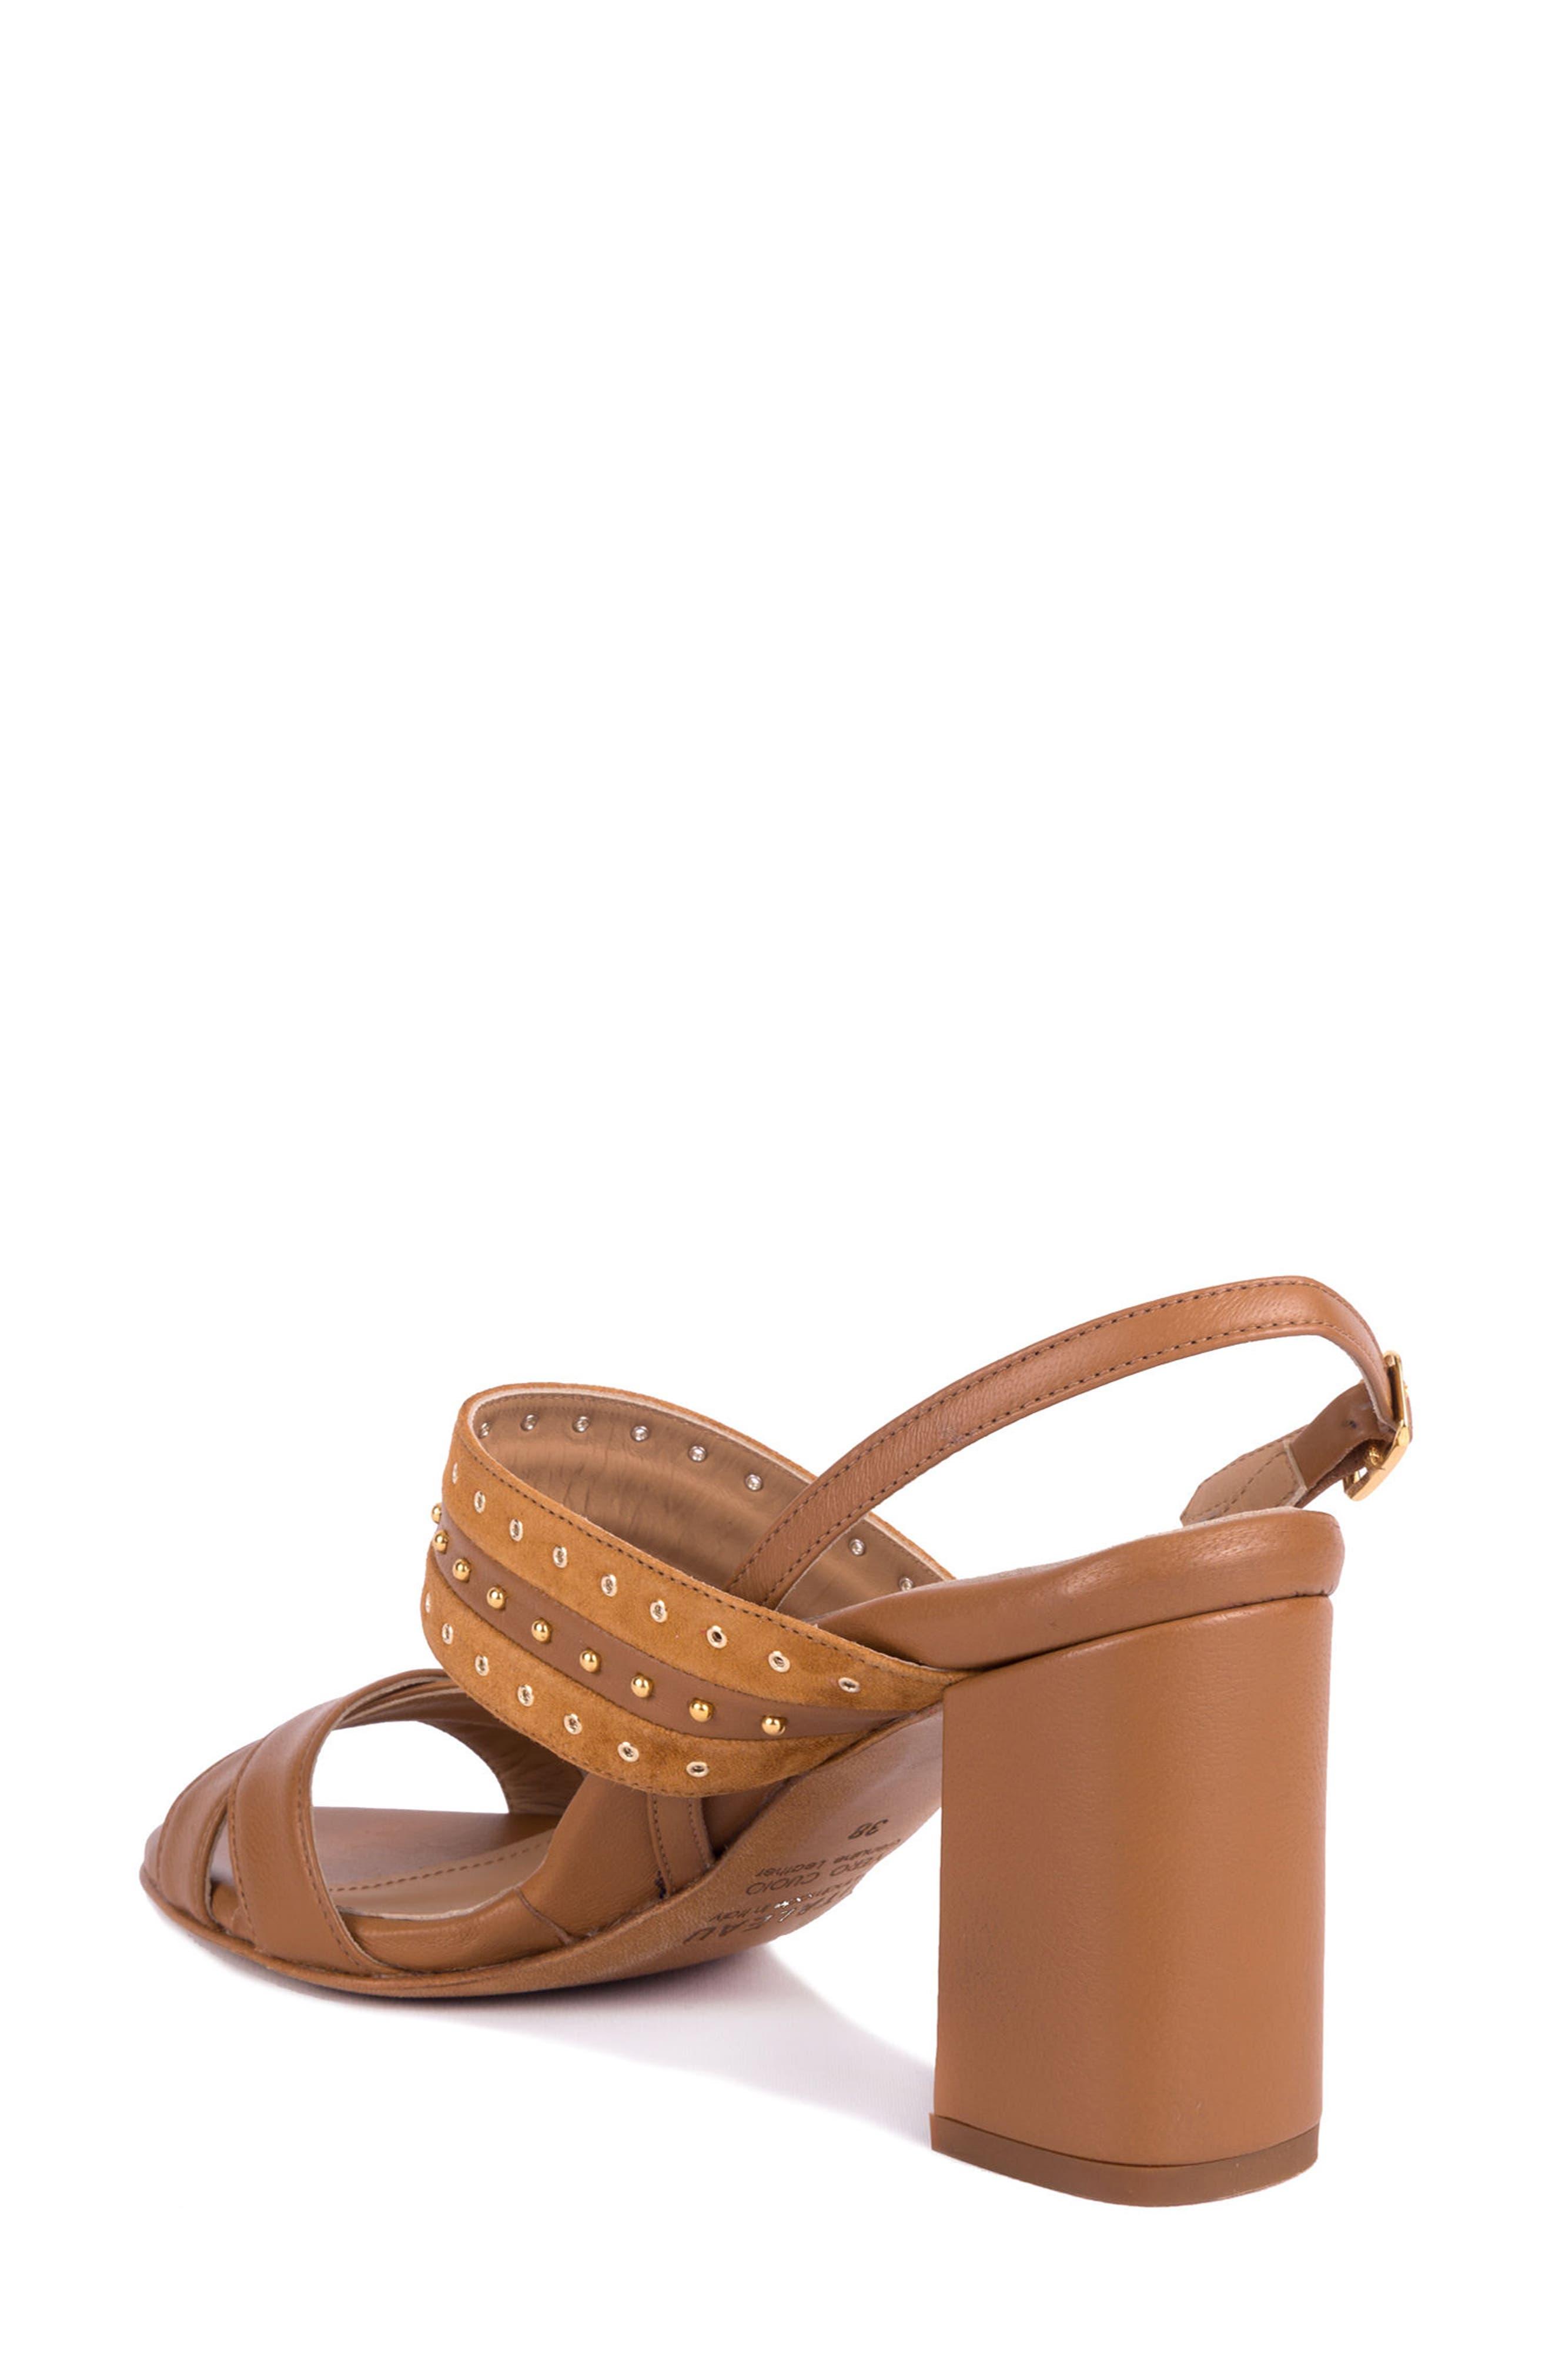 Soldani Studded Slingback Sandal,                             Alternate thumbnail 2, color,